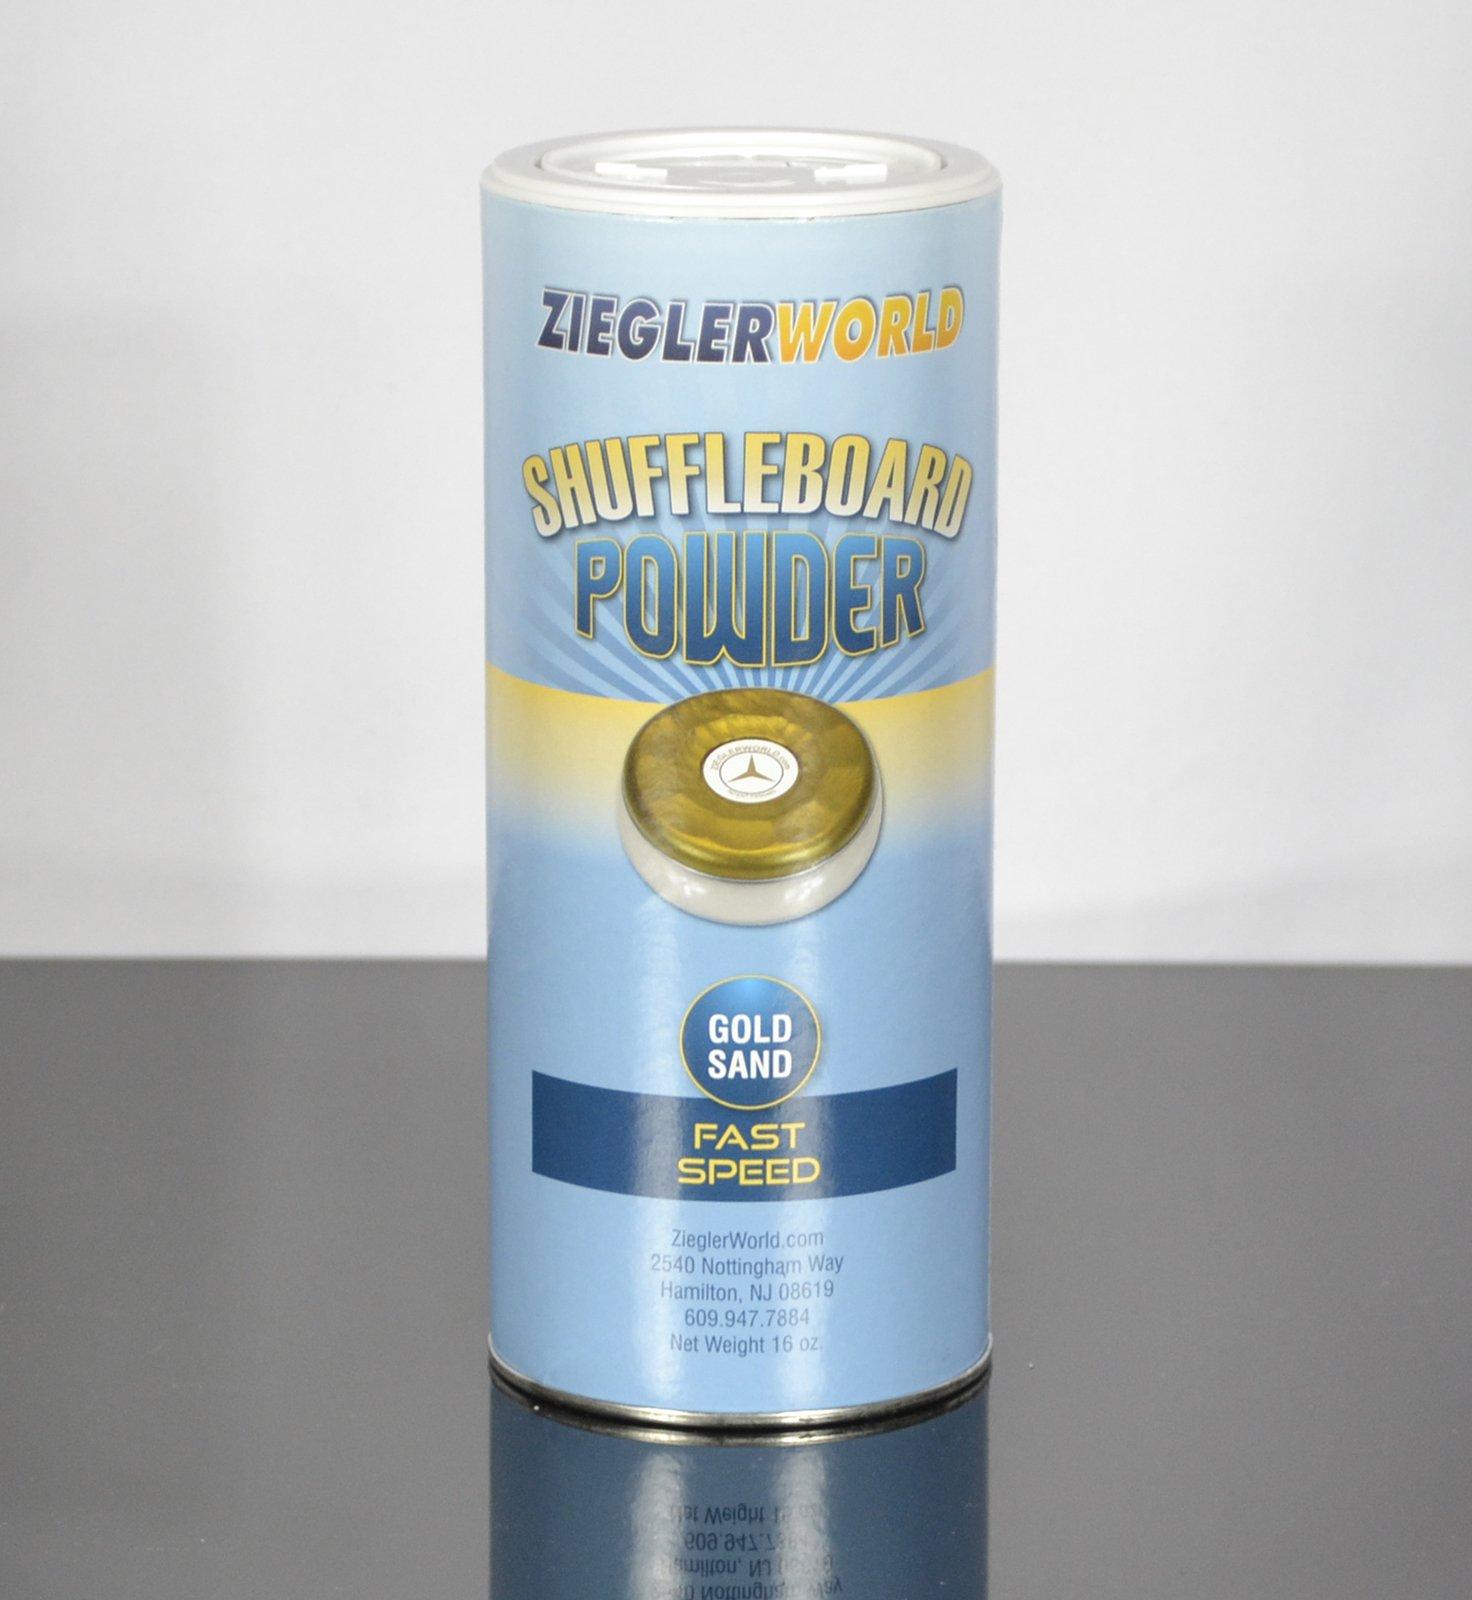 Zieglerworld 1 can Gold Sand Table Shuffleboard Powder Wax - Fast Speed by Zieglerworld